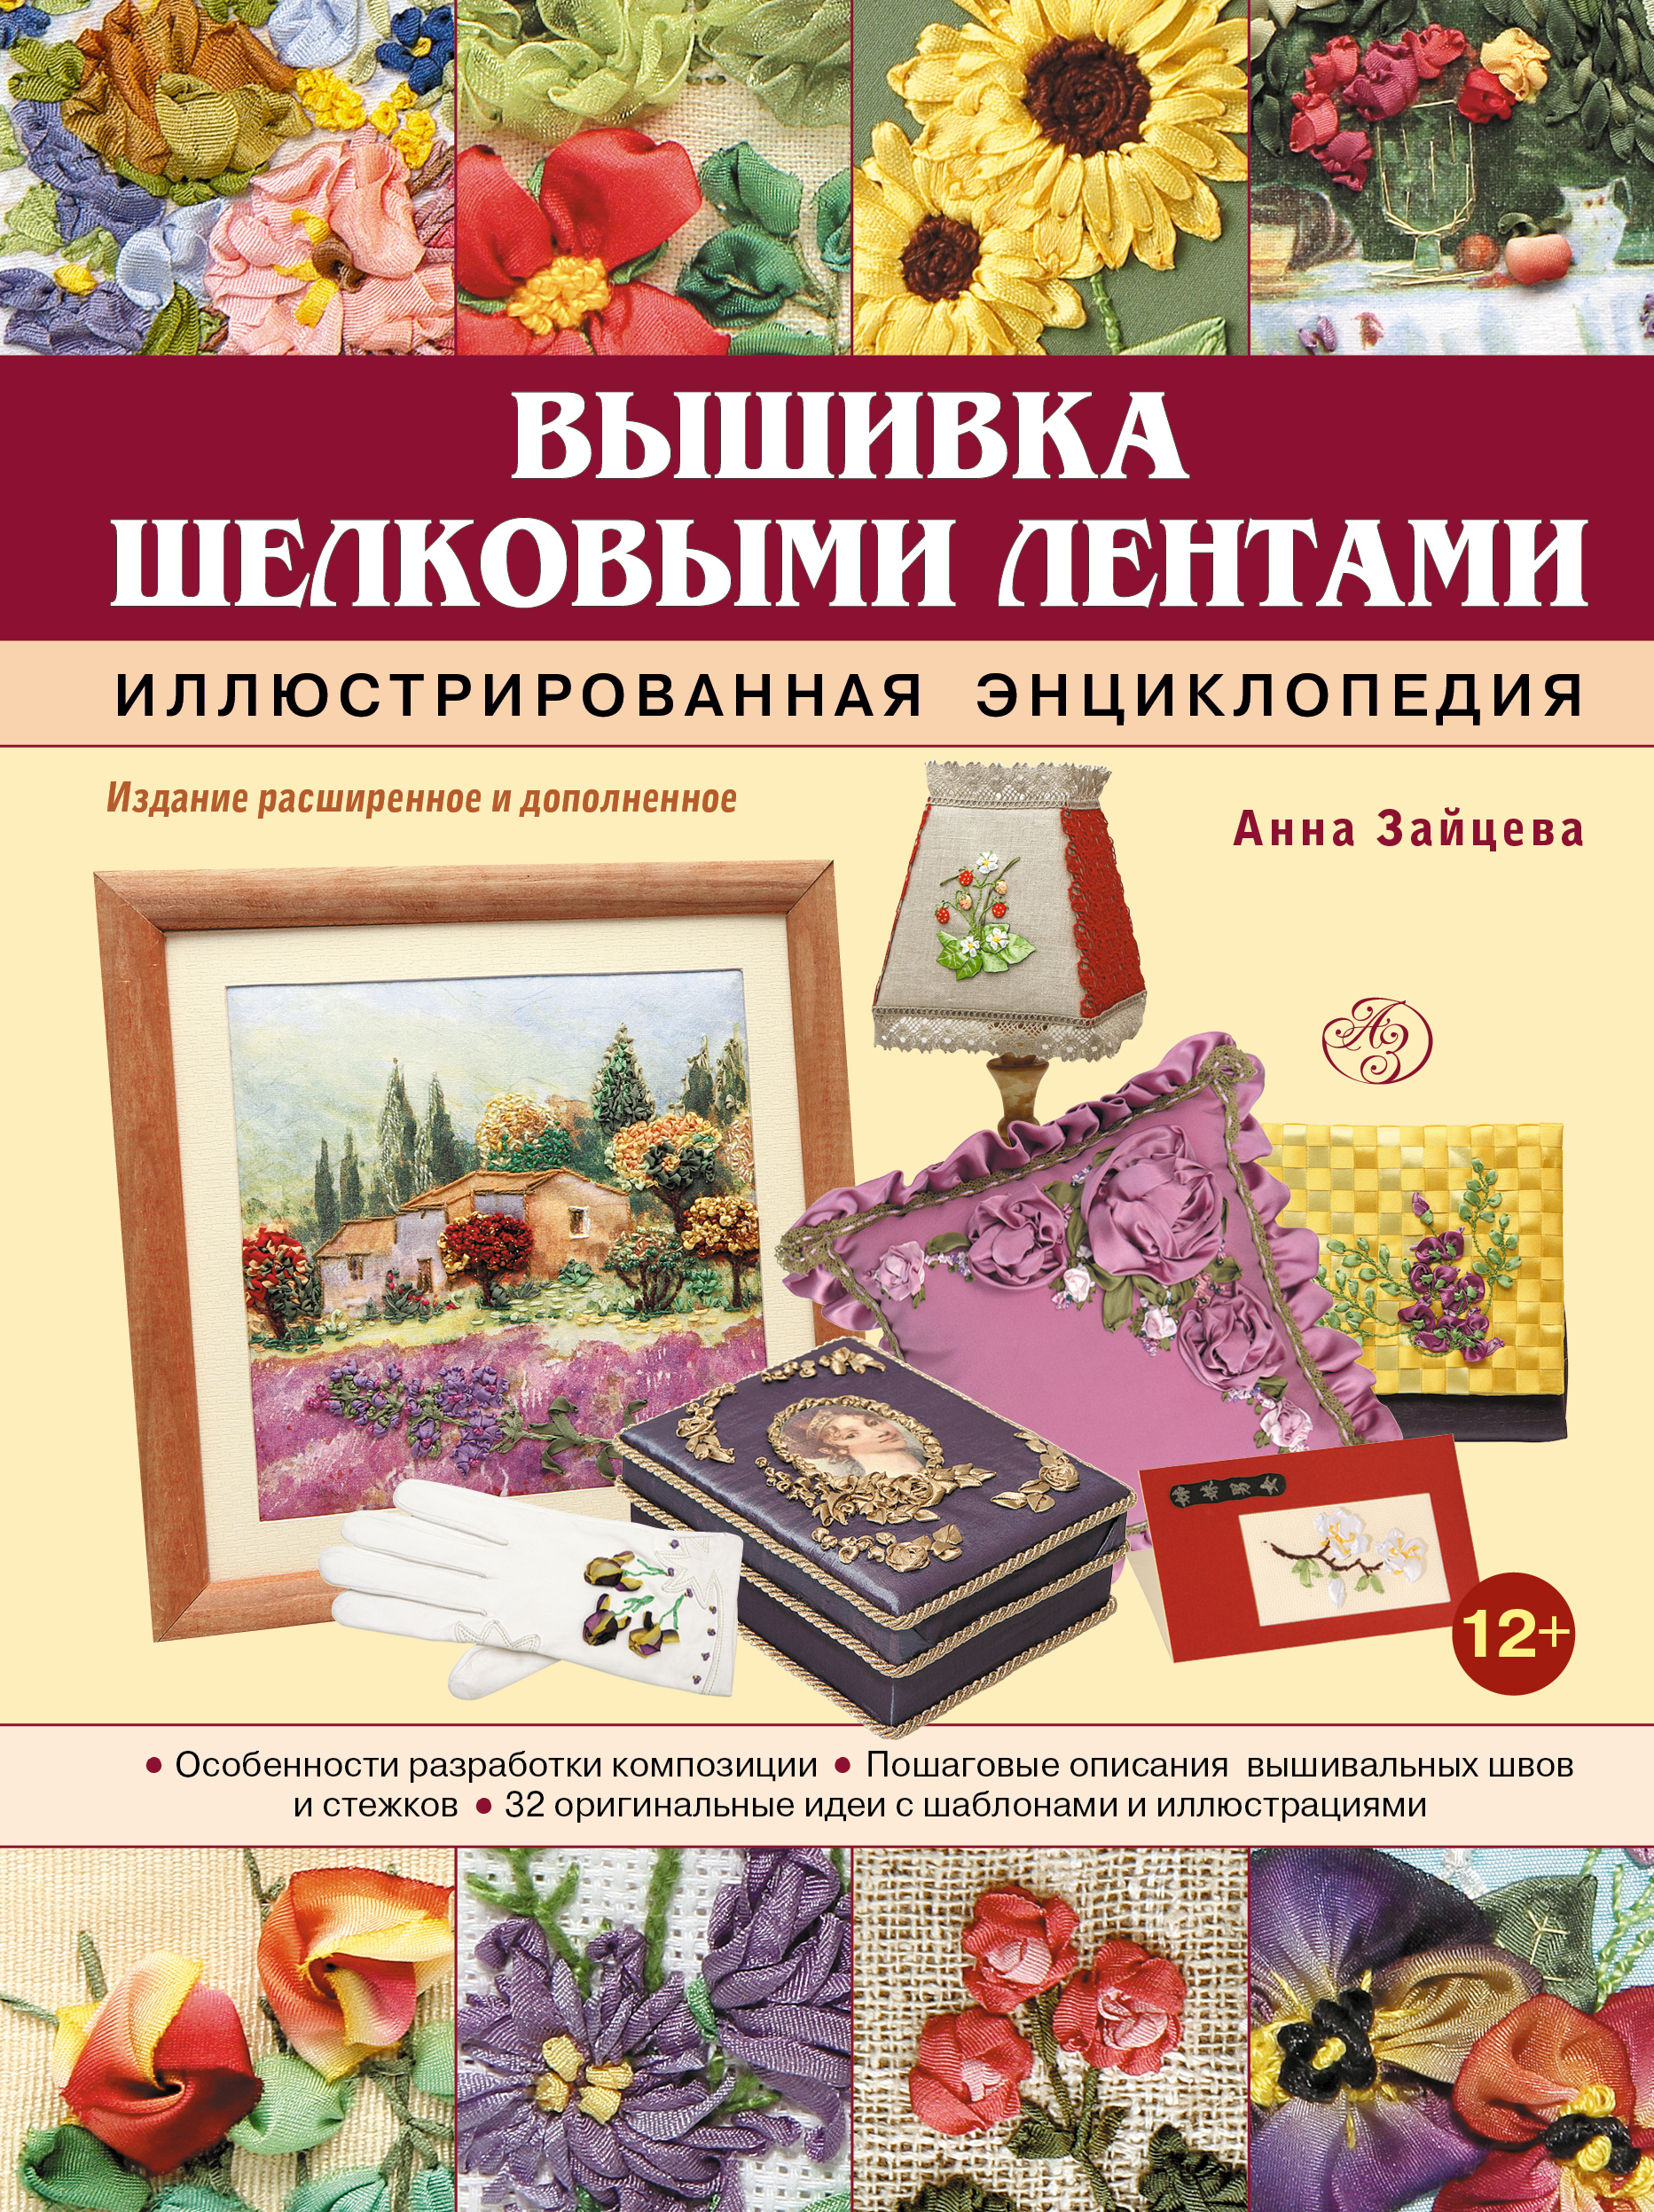 Вышивка шелковыми лентами. Иллюстрированная энциклопедия ( Зайцева А.А.  )